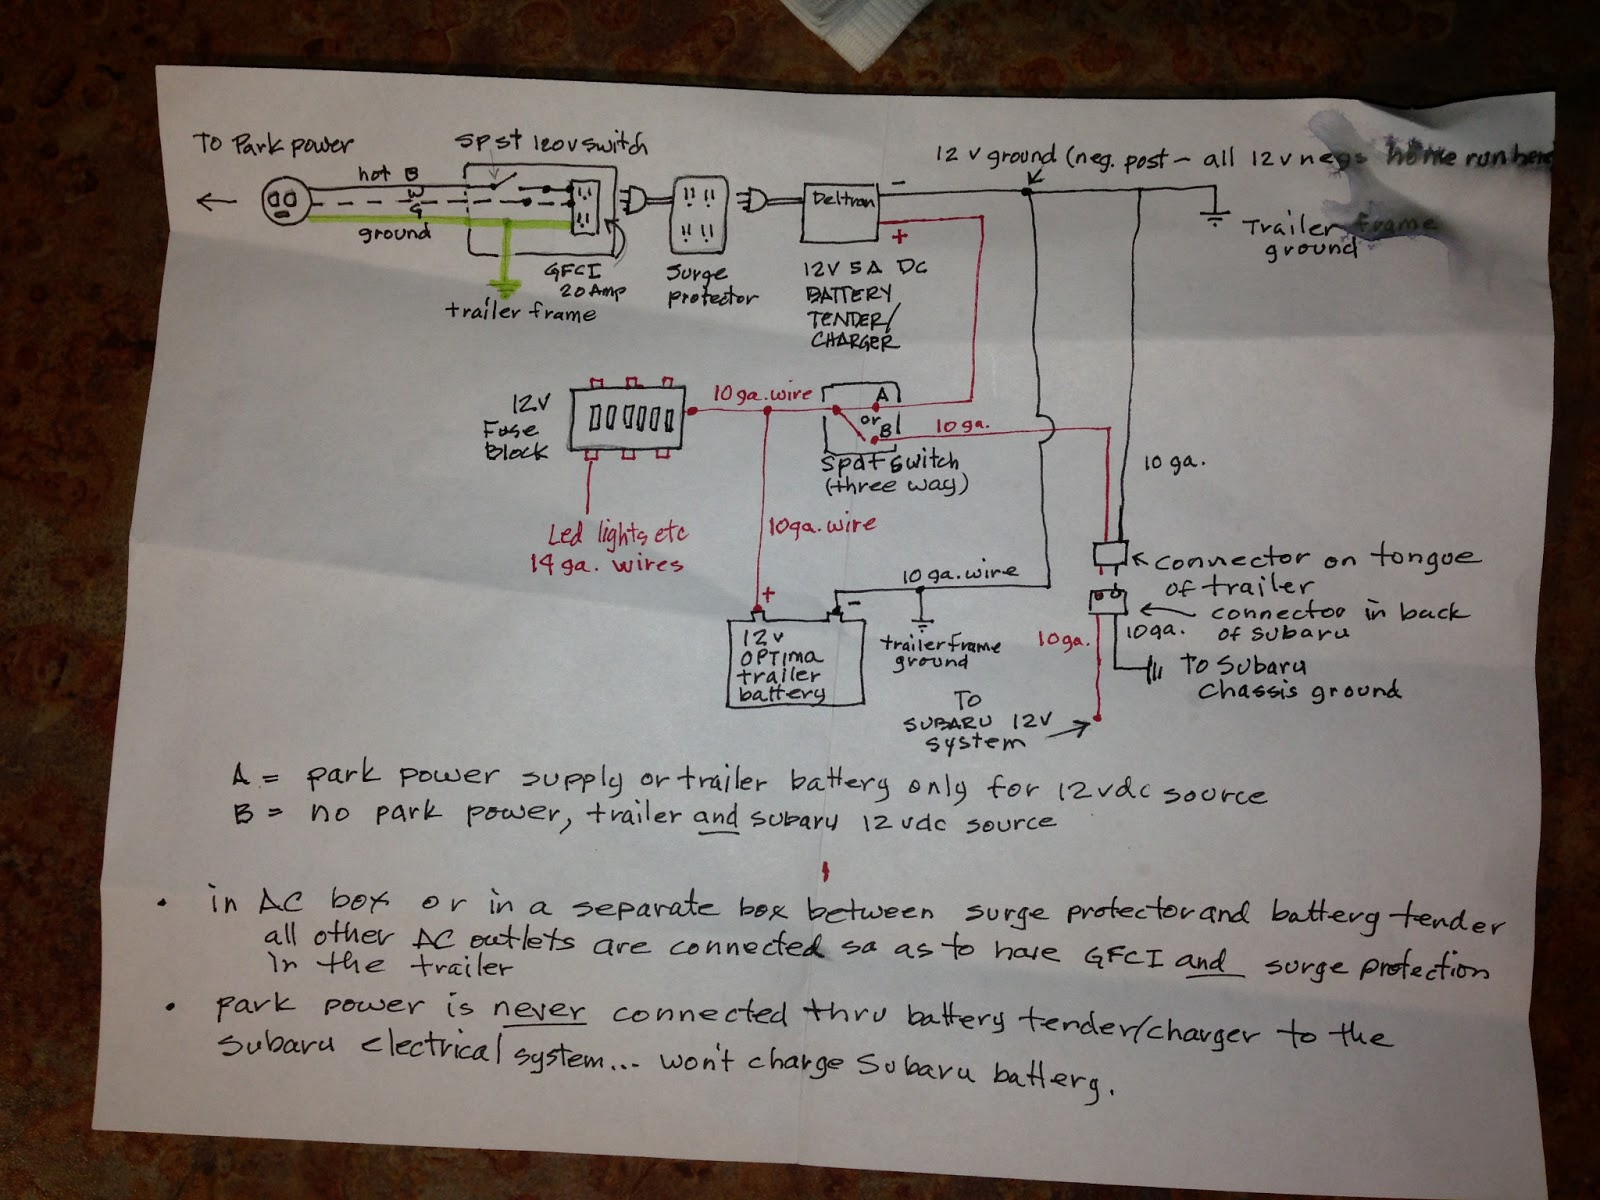 teardrop electrical wiring diagram wiring library teardrop electrical wiring diagram [ 1600 x 1200 Pixel ]